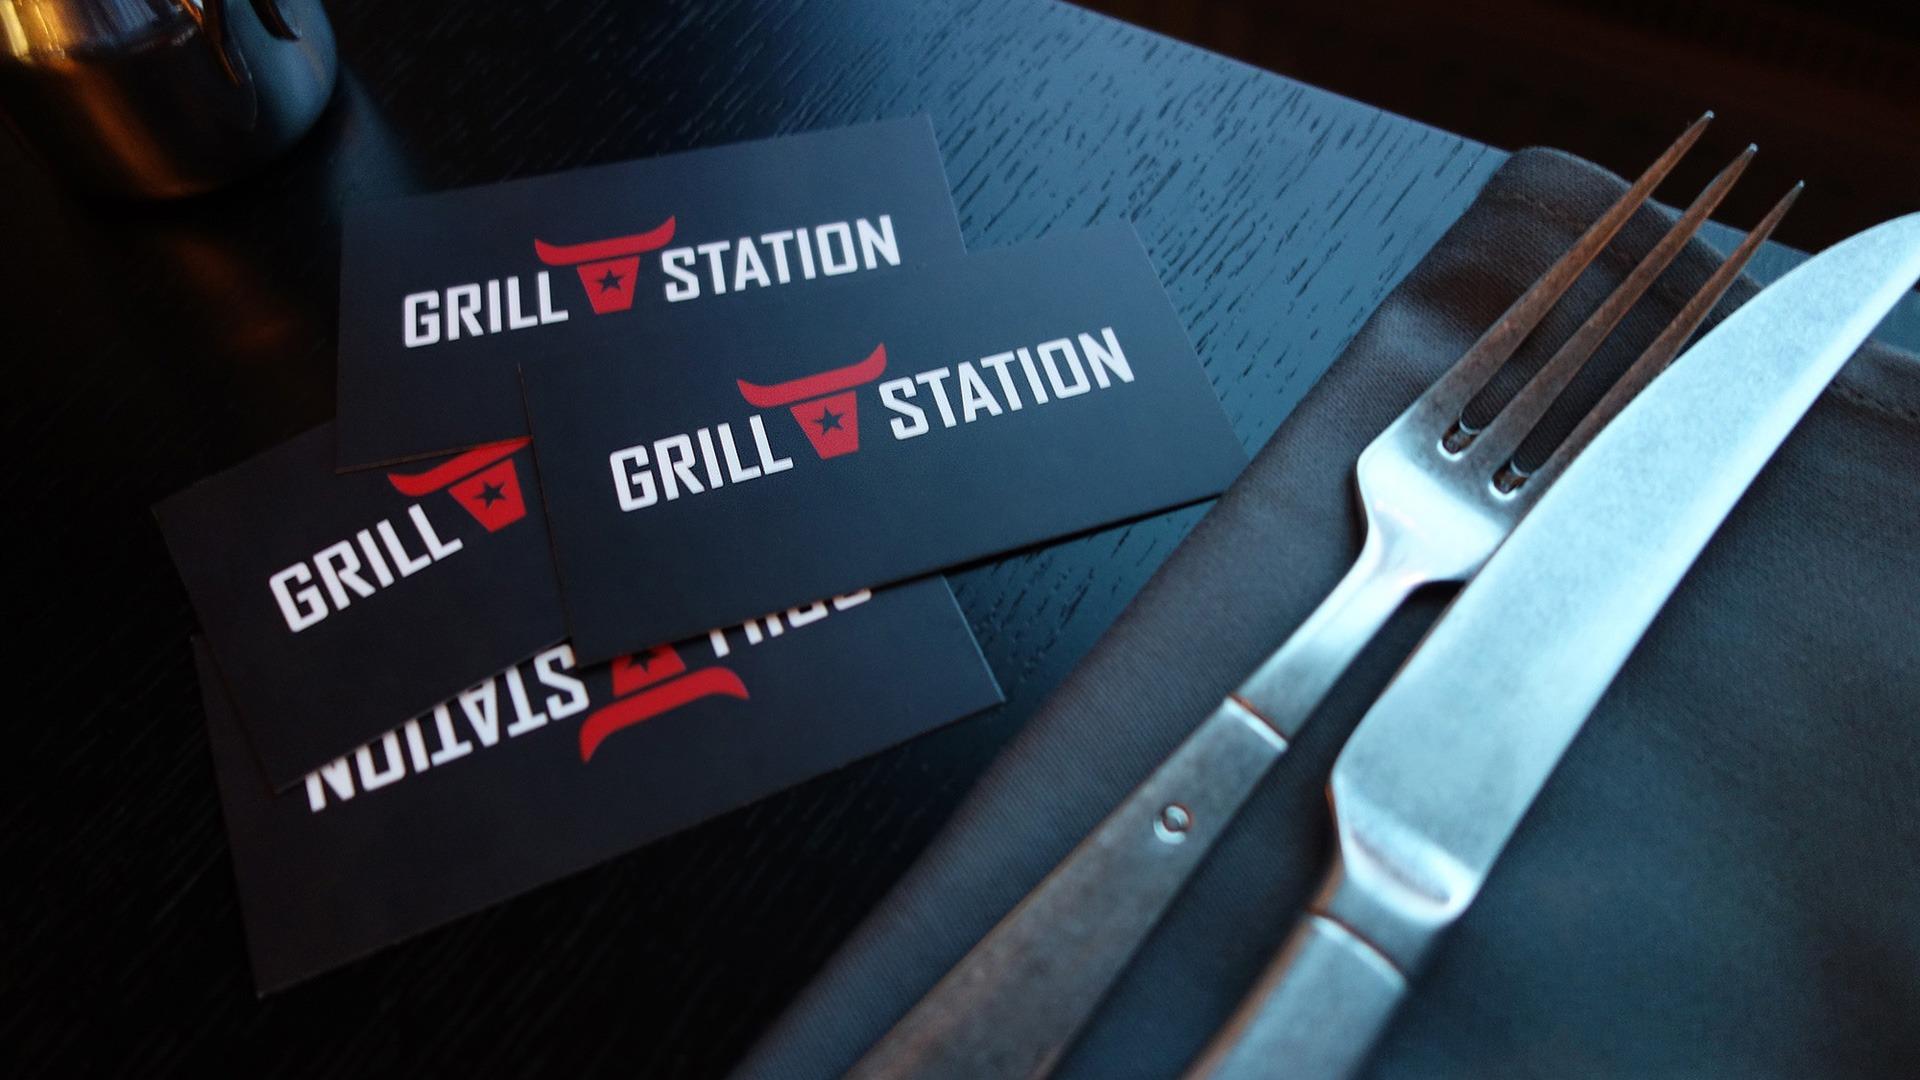 Агентство Асгард, брендинг ресторана Grill Station, фирменный стиль, Asgard branding agensy, logo